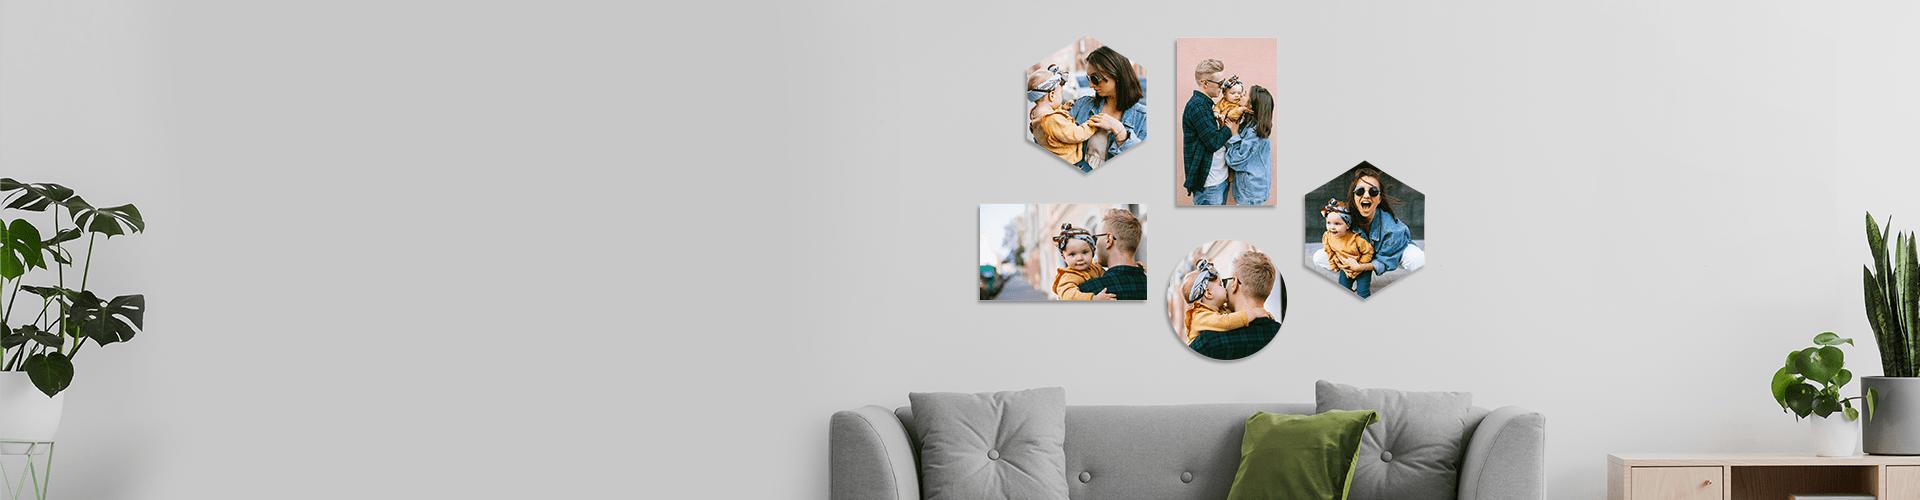 Custom Wall Tiles With Photo Prints